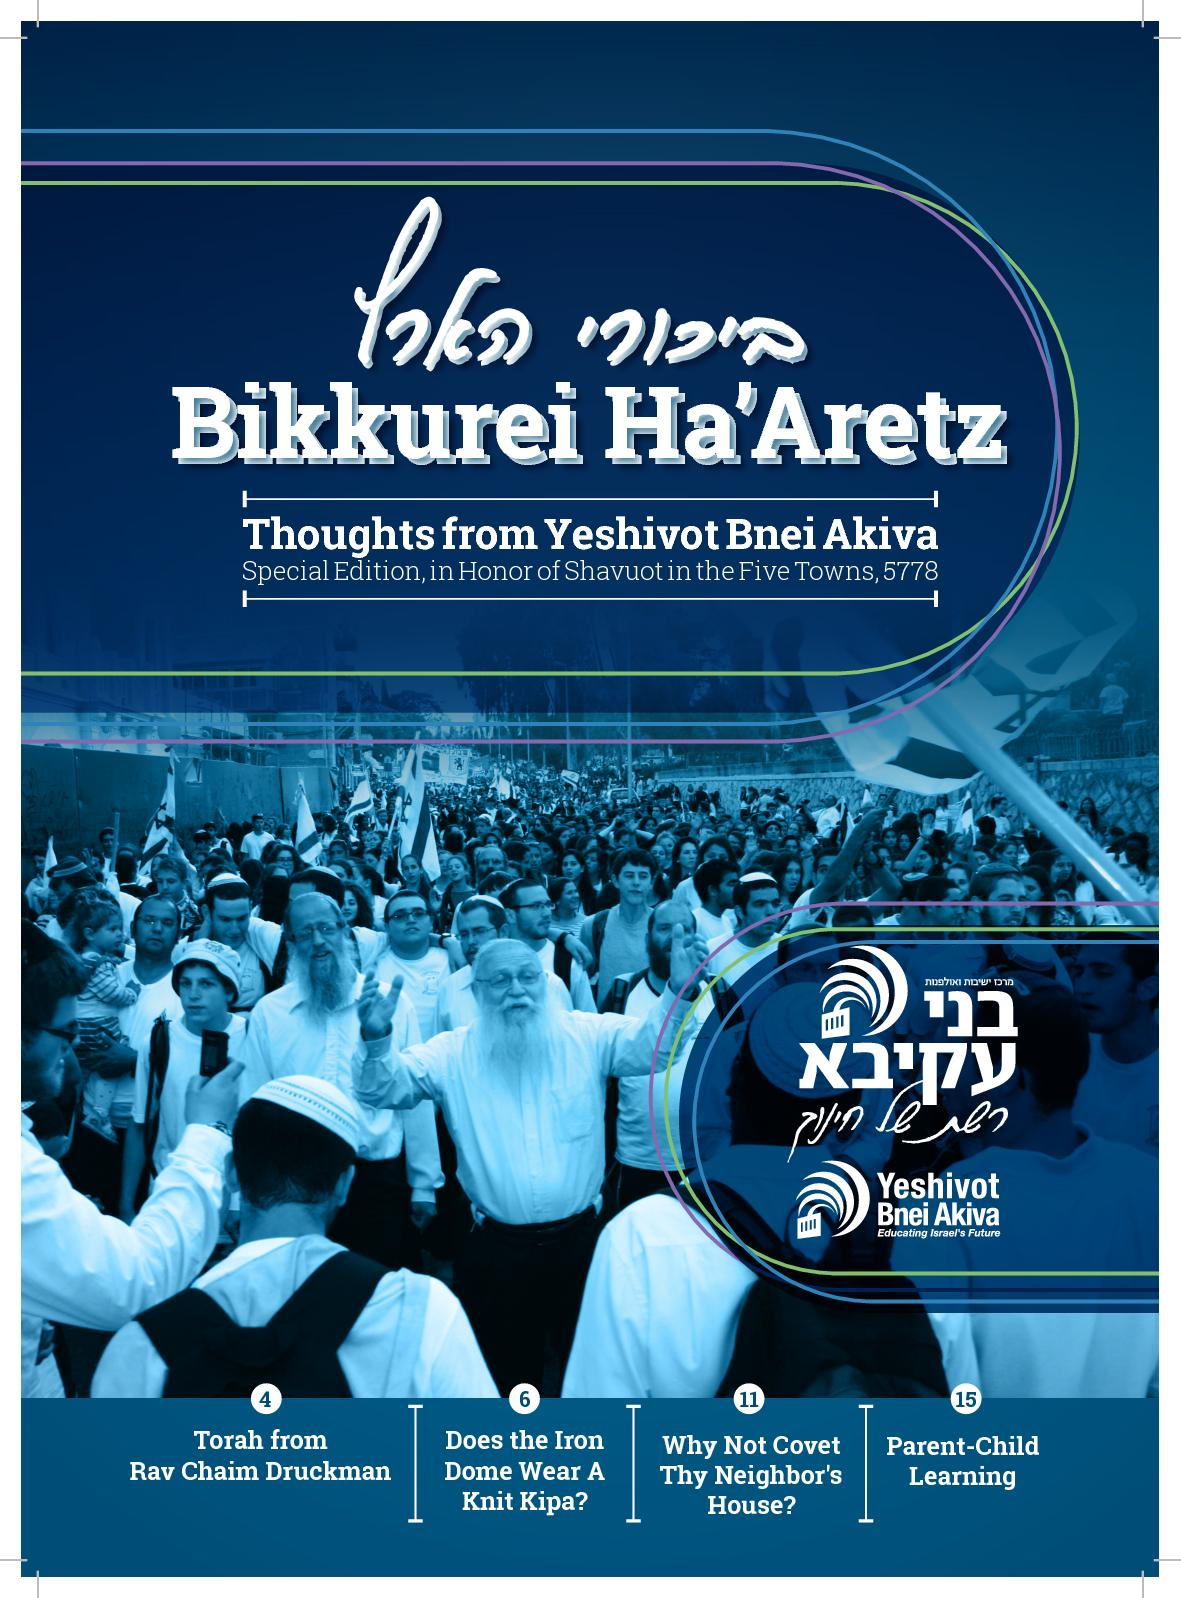 Calaméo - Yeshivot Bnei Akiva Shavuot 5778